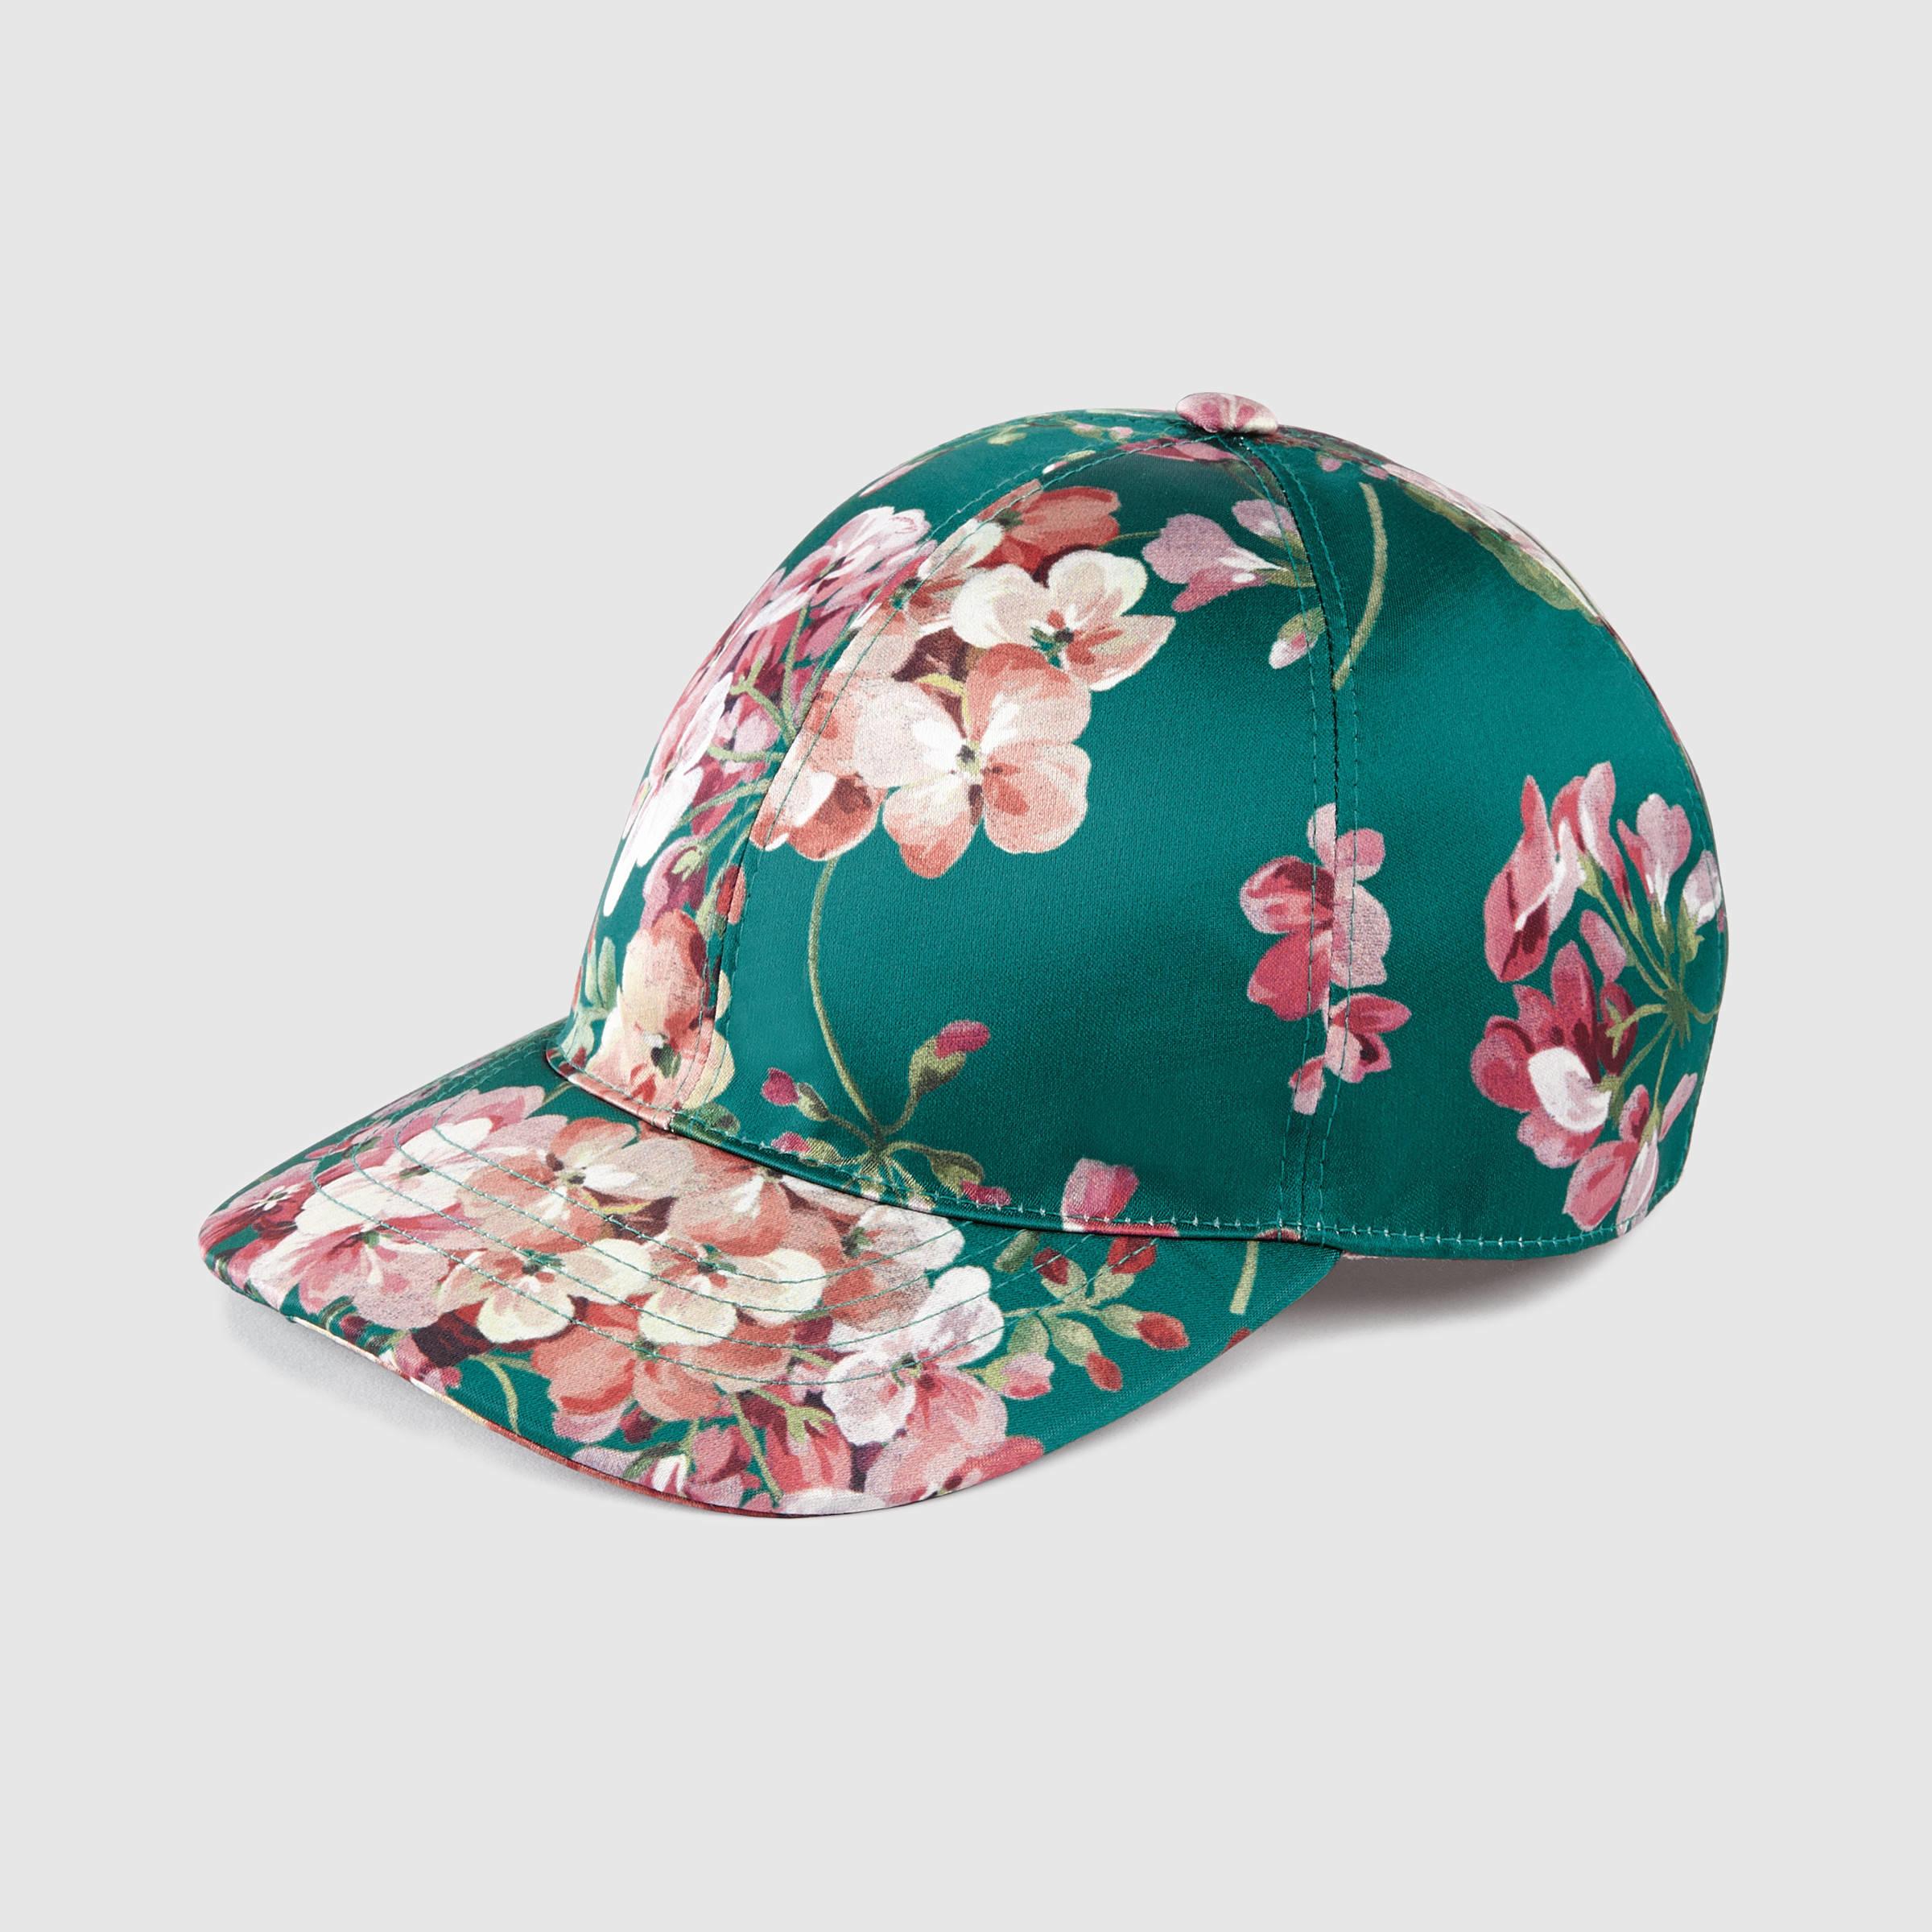 Lyst - Gucci Blooms Silk Baseball Hat in Green for Men 2b424b5f683